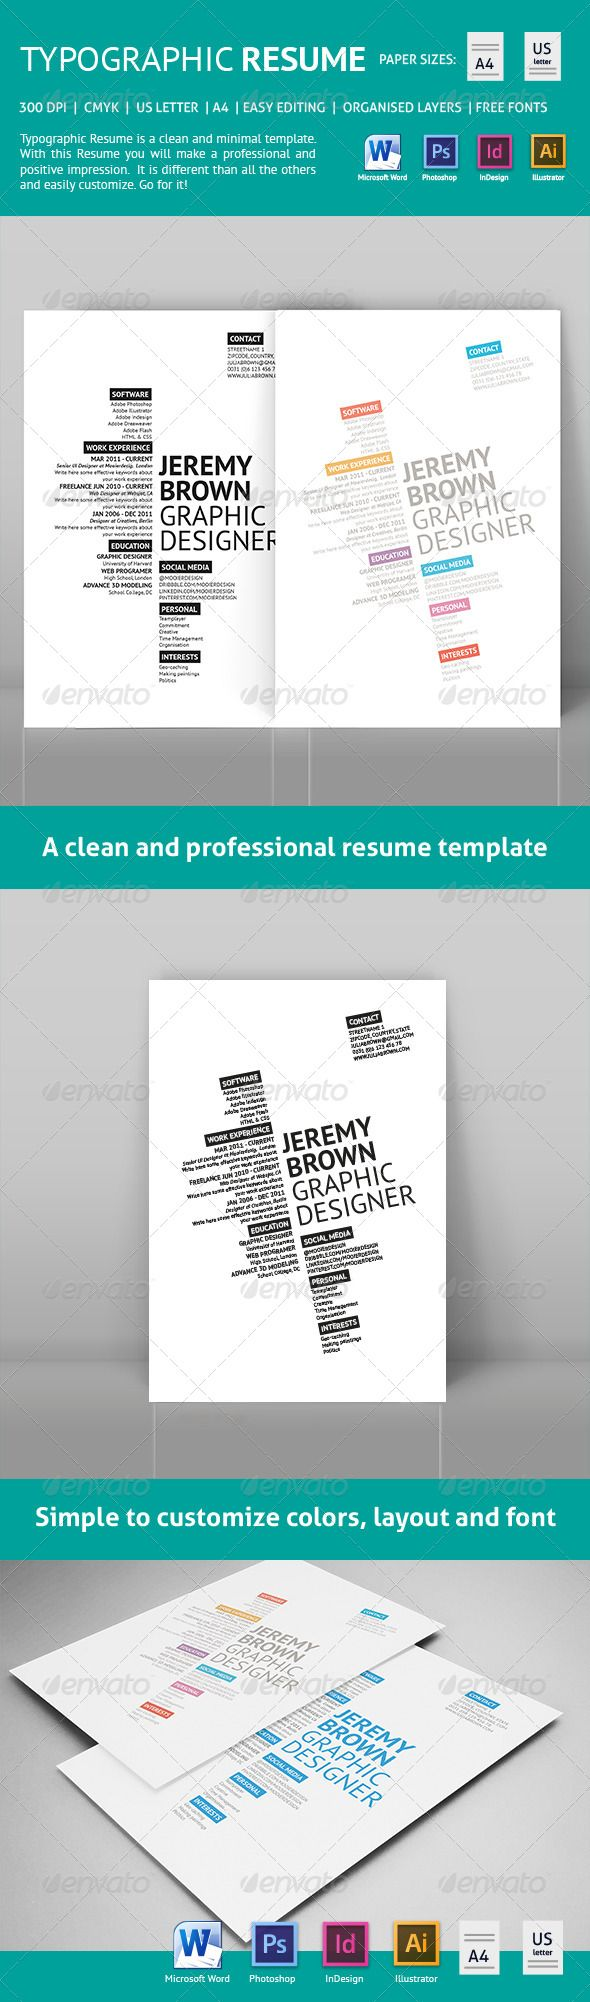 Best 25 Job Resume Template Ideas On Pinterest Resume Writing